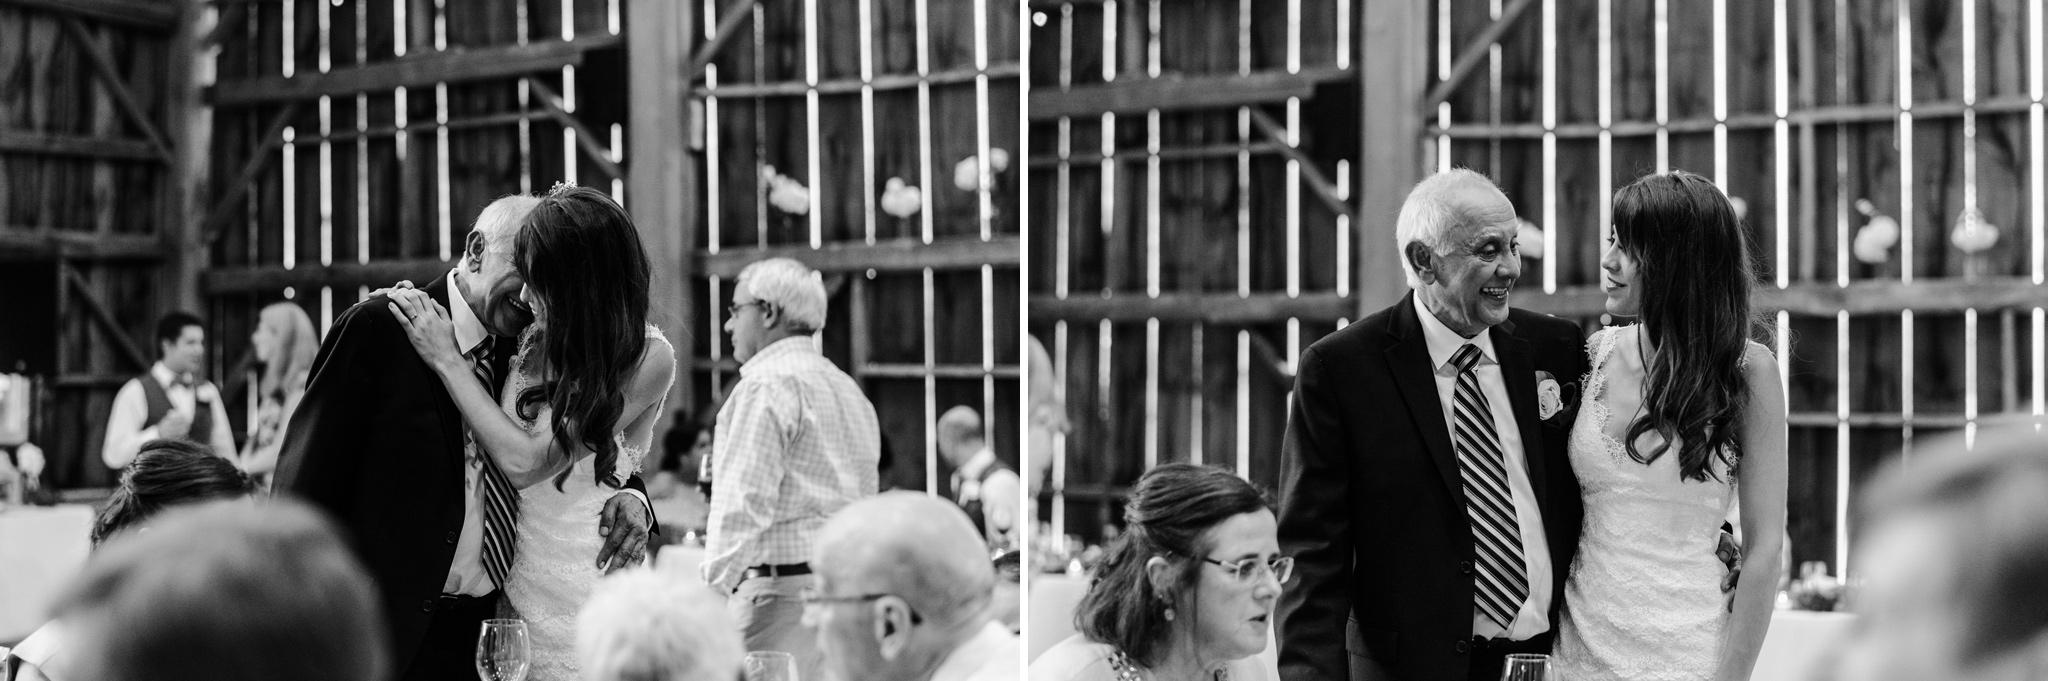 104-sydenham-ridge-wedding-barn-reception-toronto-photographer.jpg